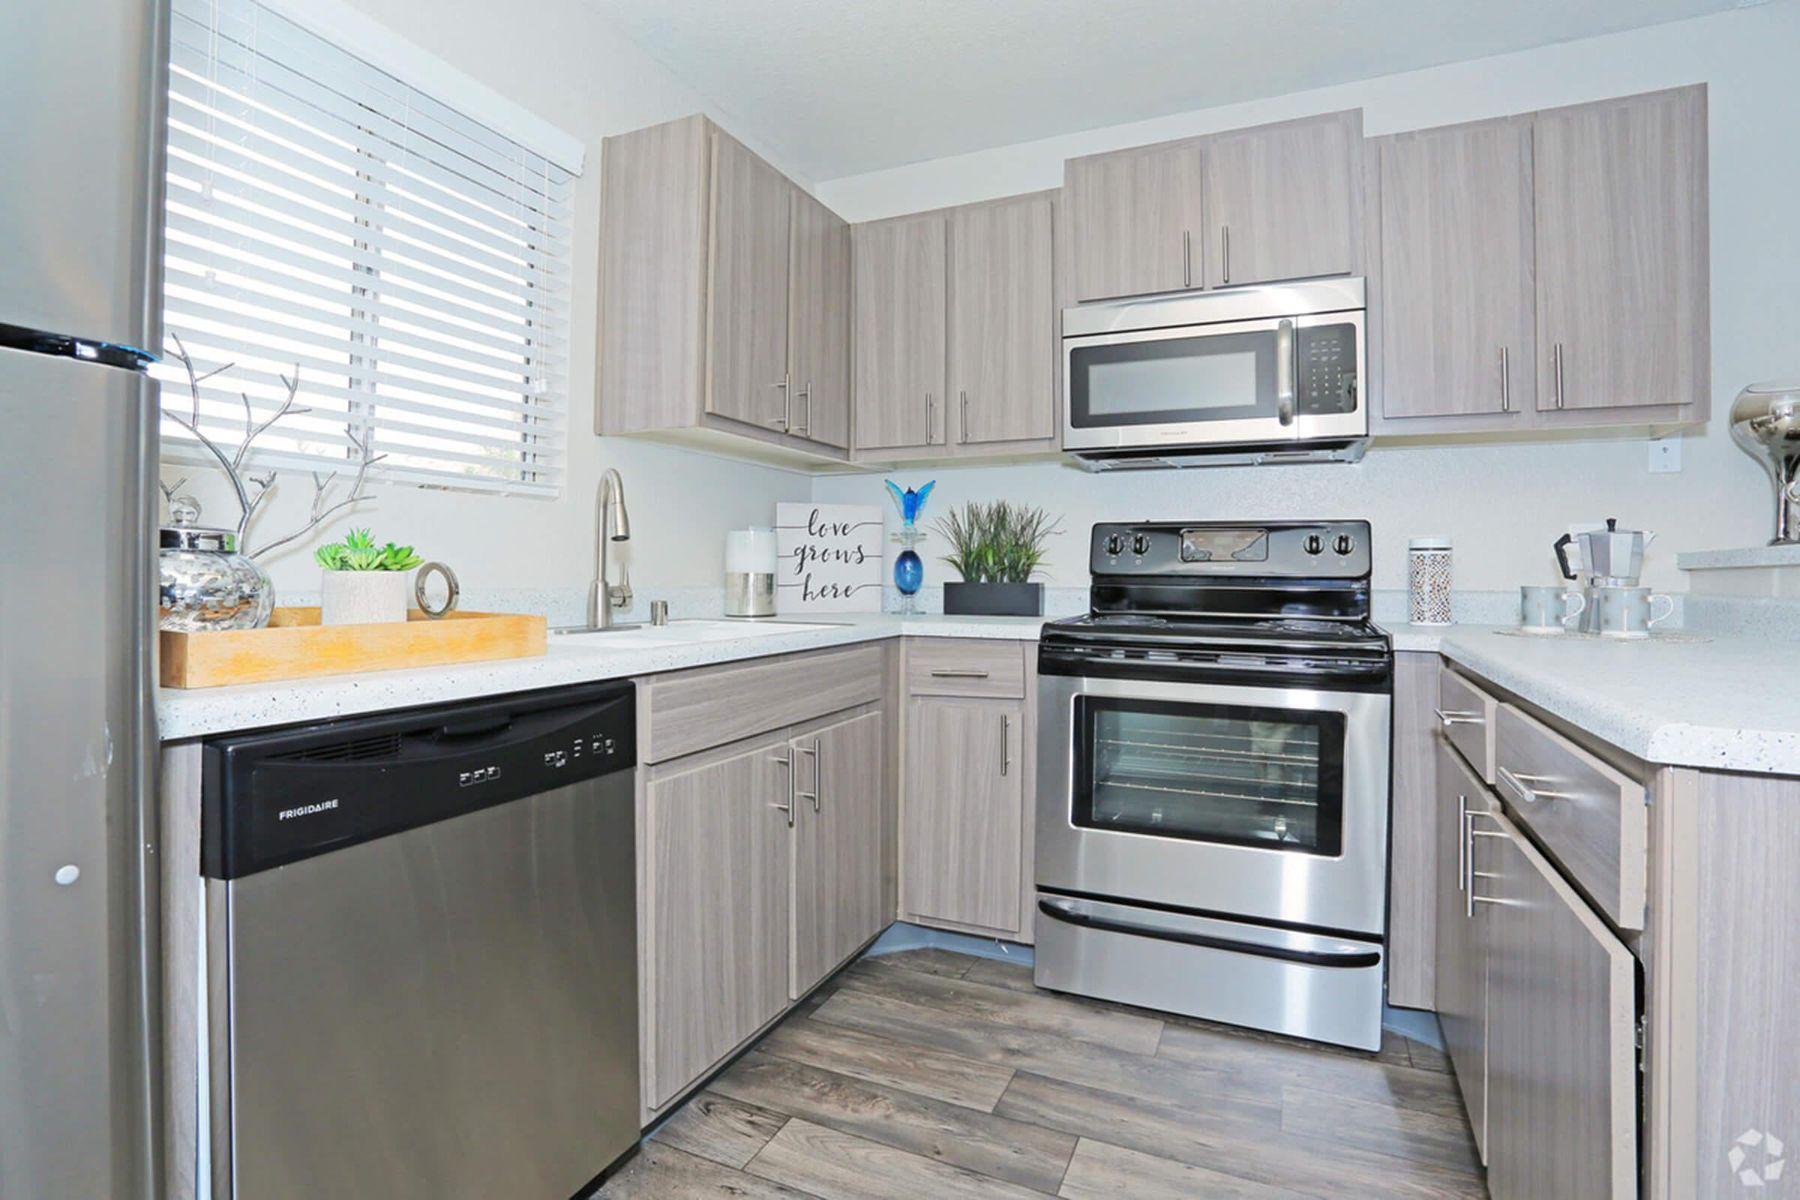 sunset-hills-apartments-henderson-nv-2br-2ba---960-sf-kitchen.jpg